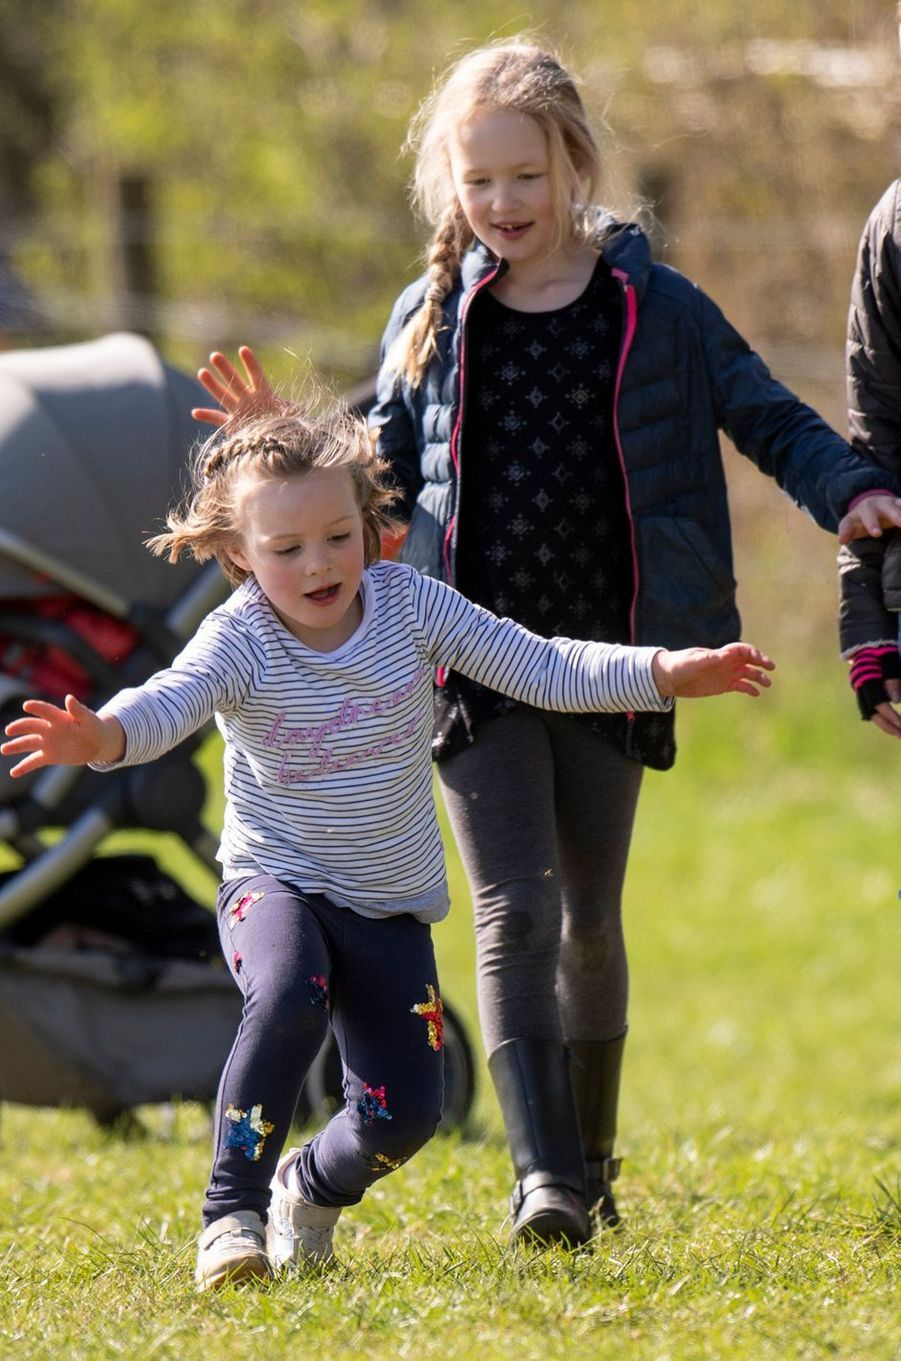 Mia Tindall et Savannah Phillips à Gatcombe Park, le 24 mars 2019